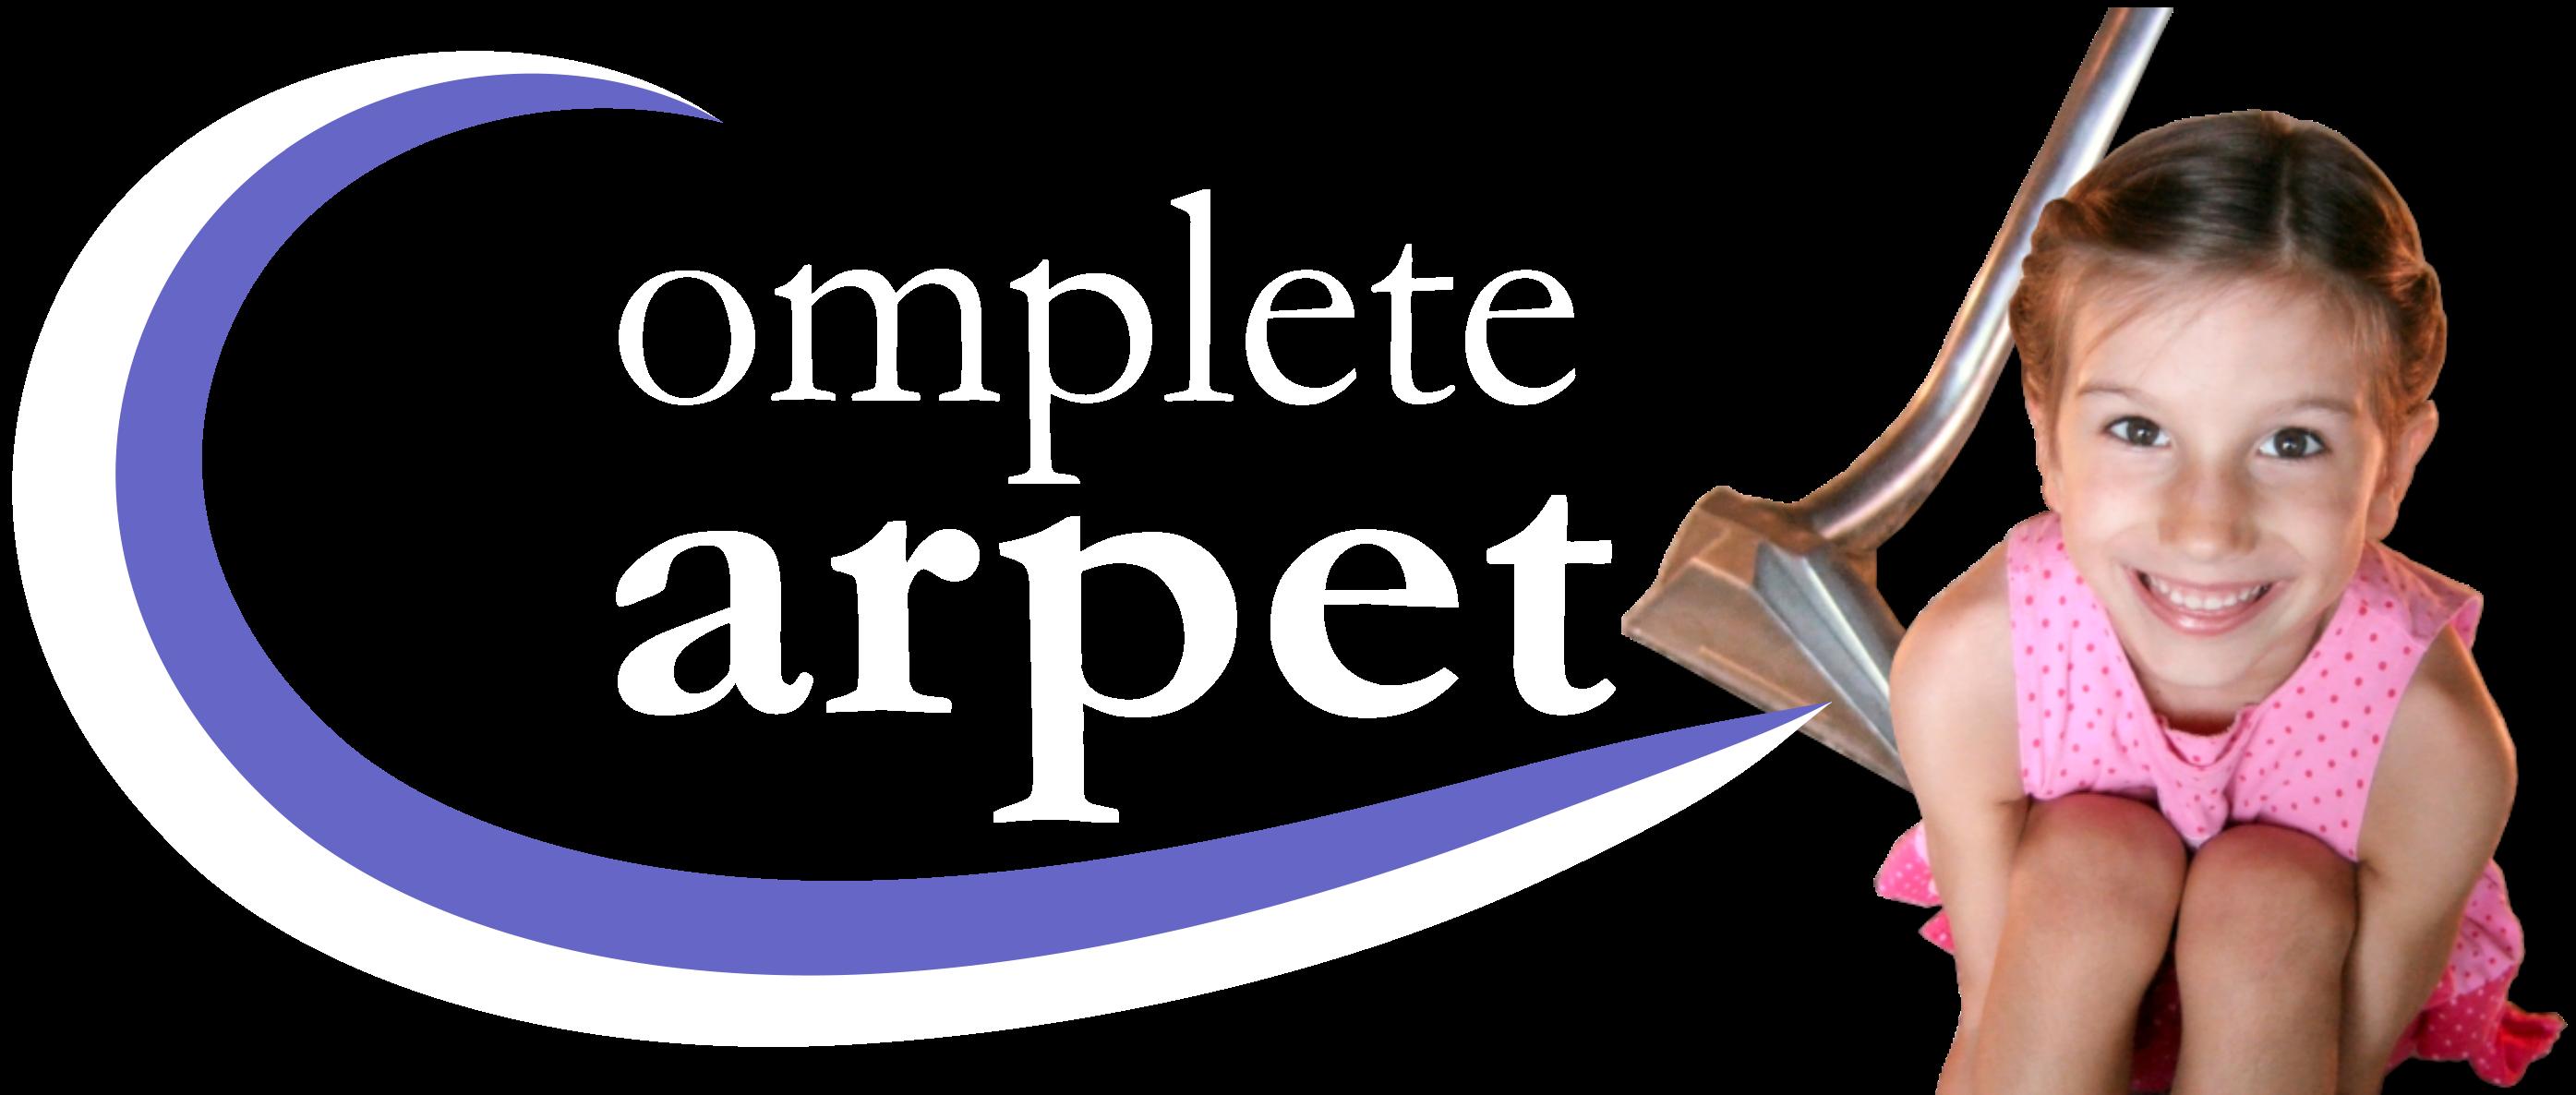 Complete Carpet